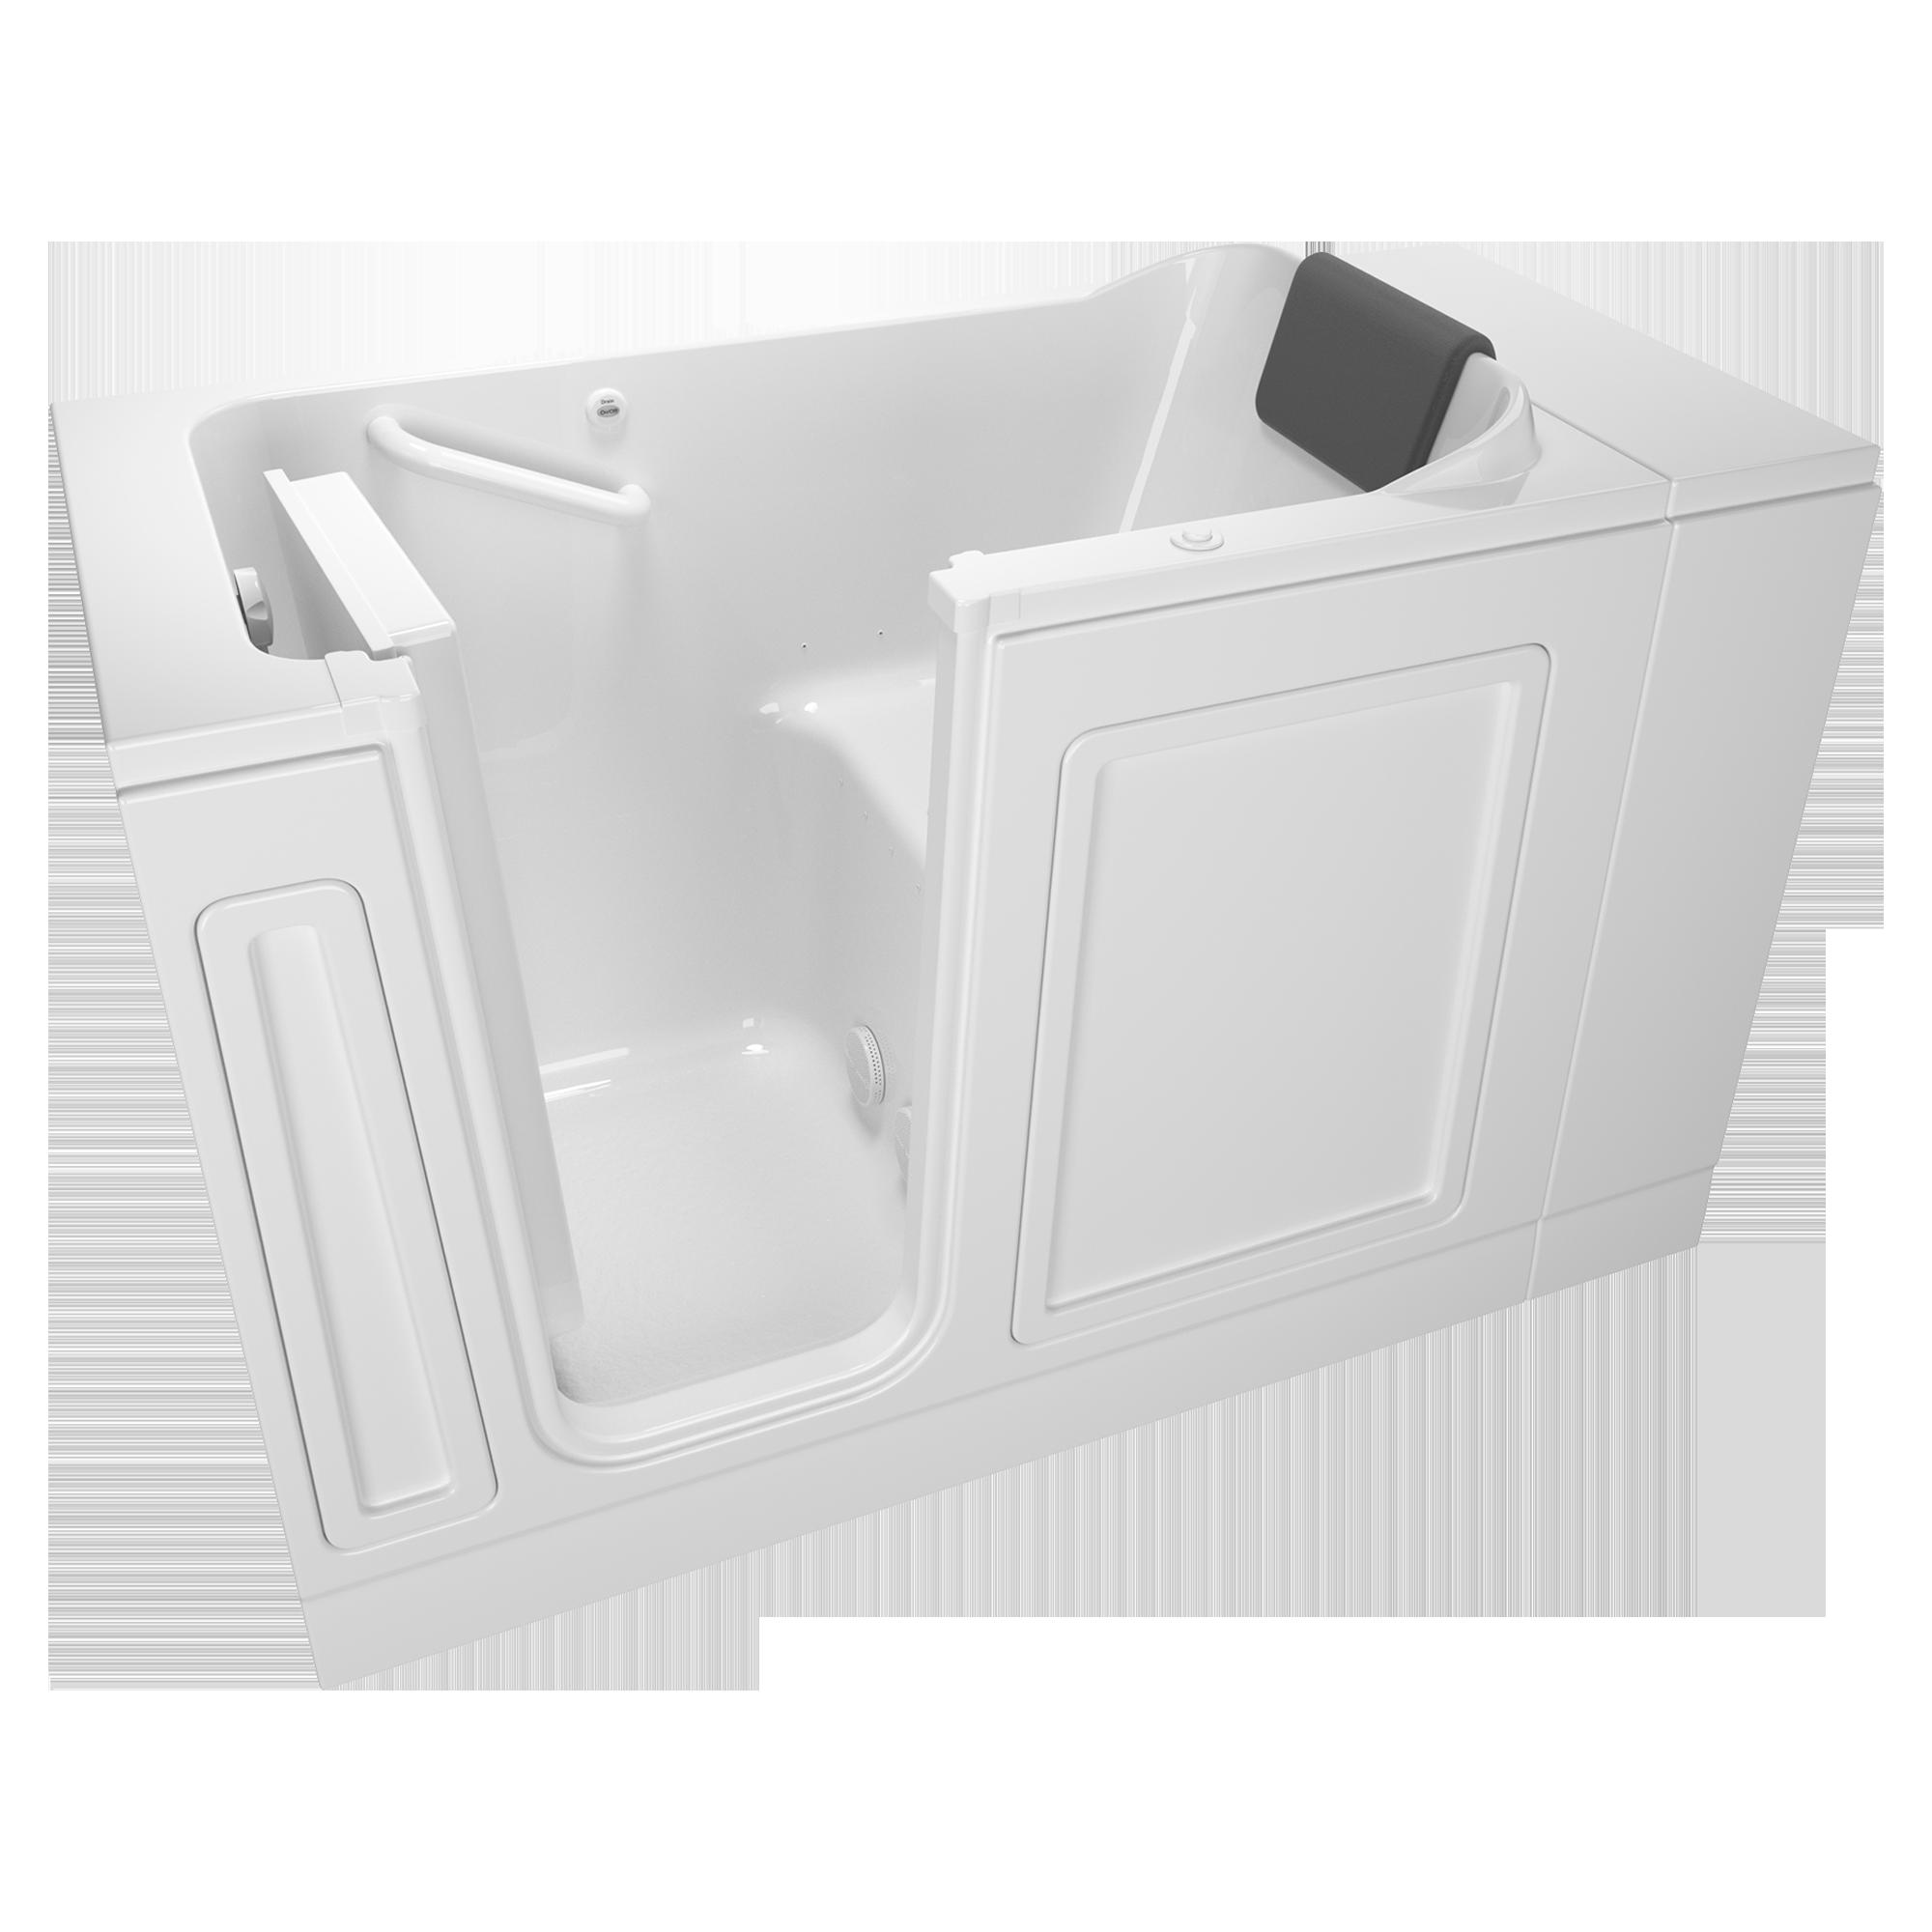 clip royalty free stock Transparent bathtub small plastic. Walk in baths by.